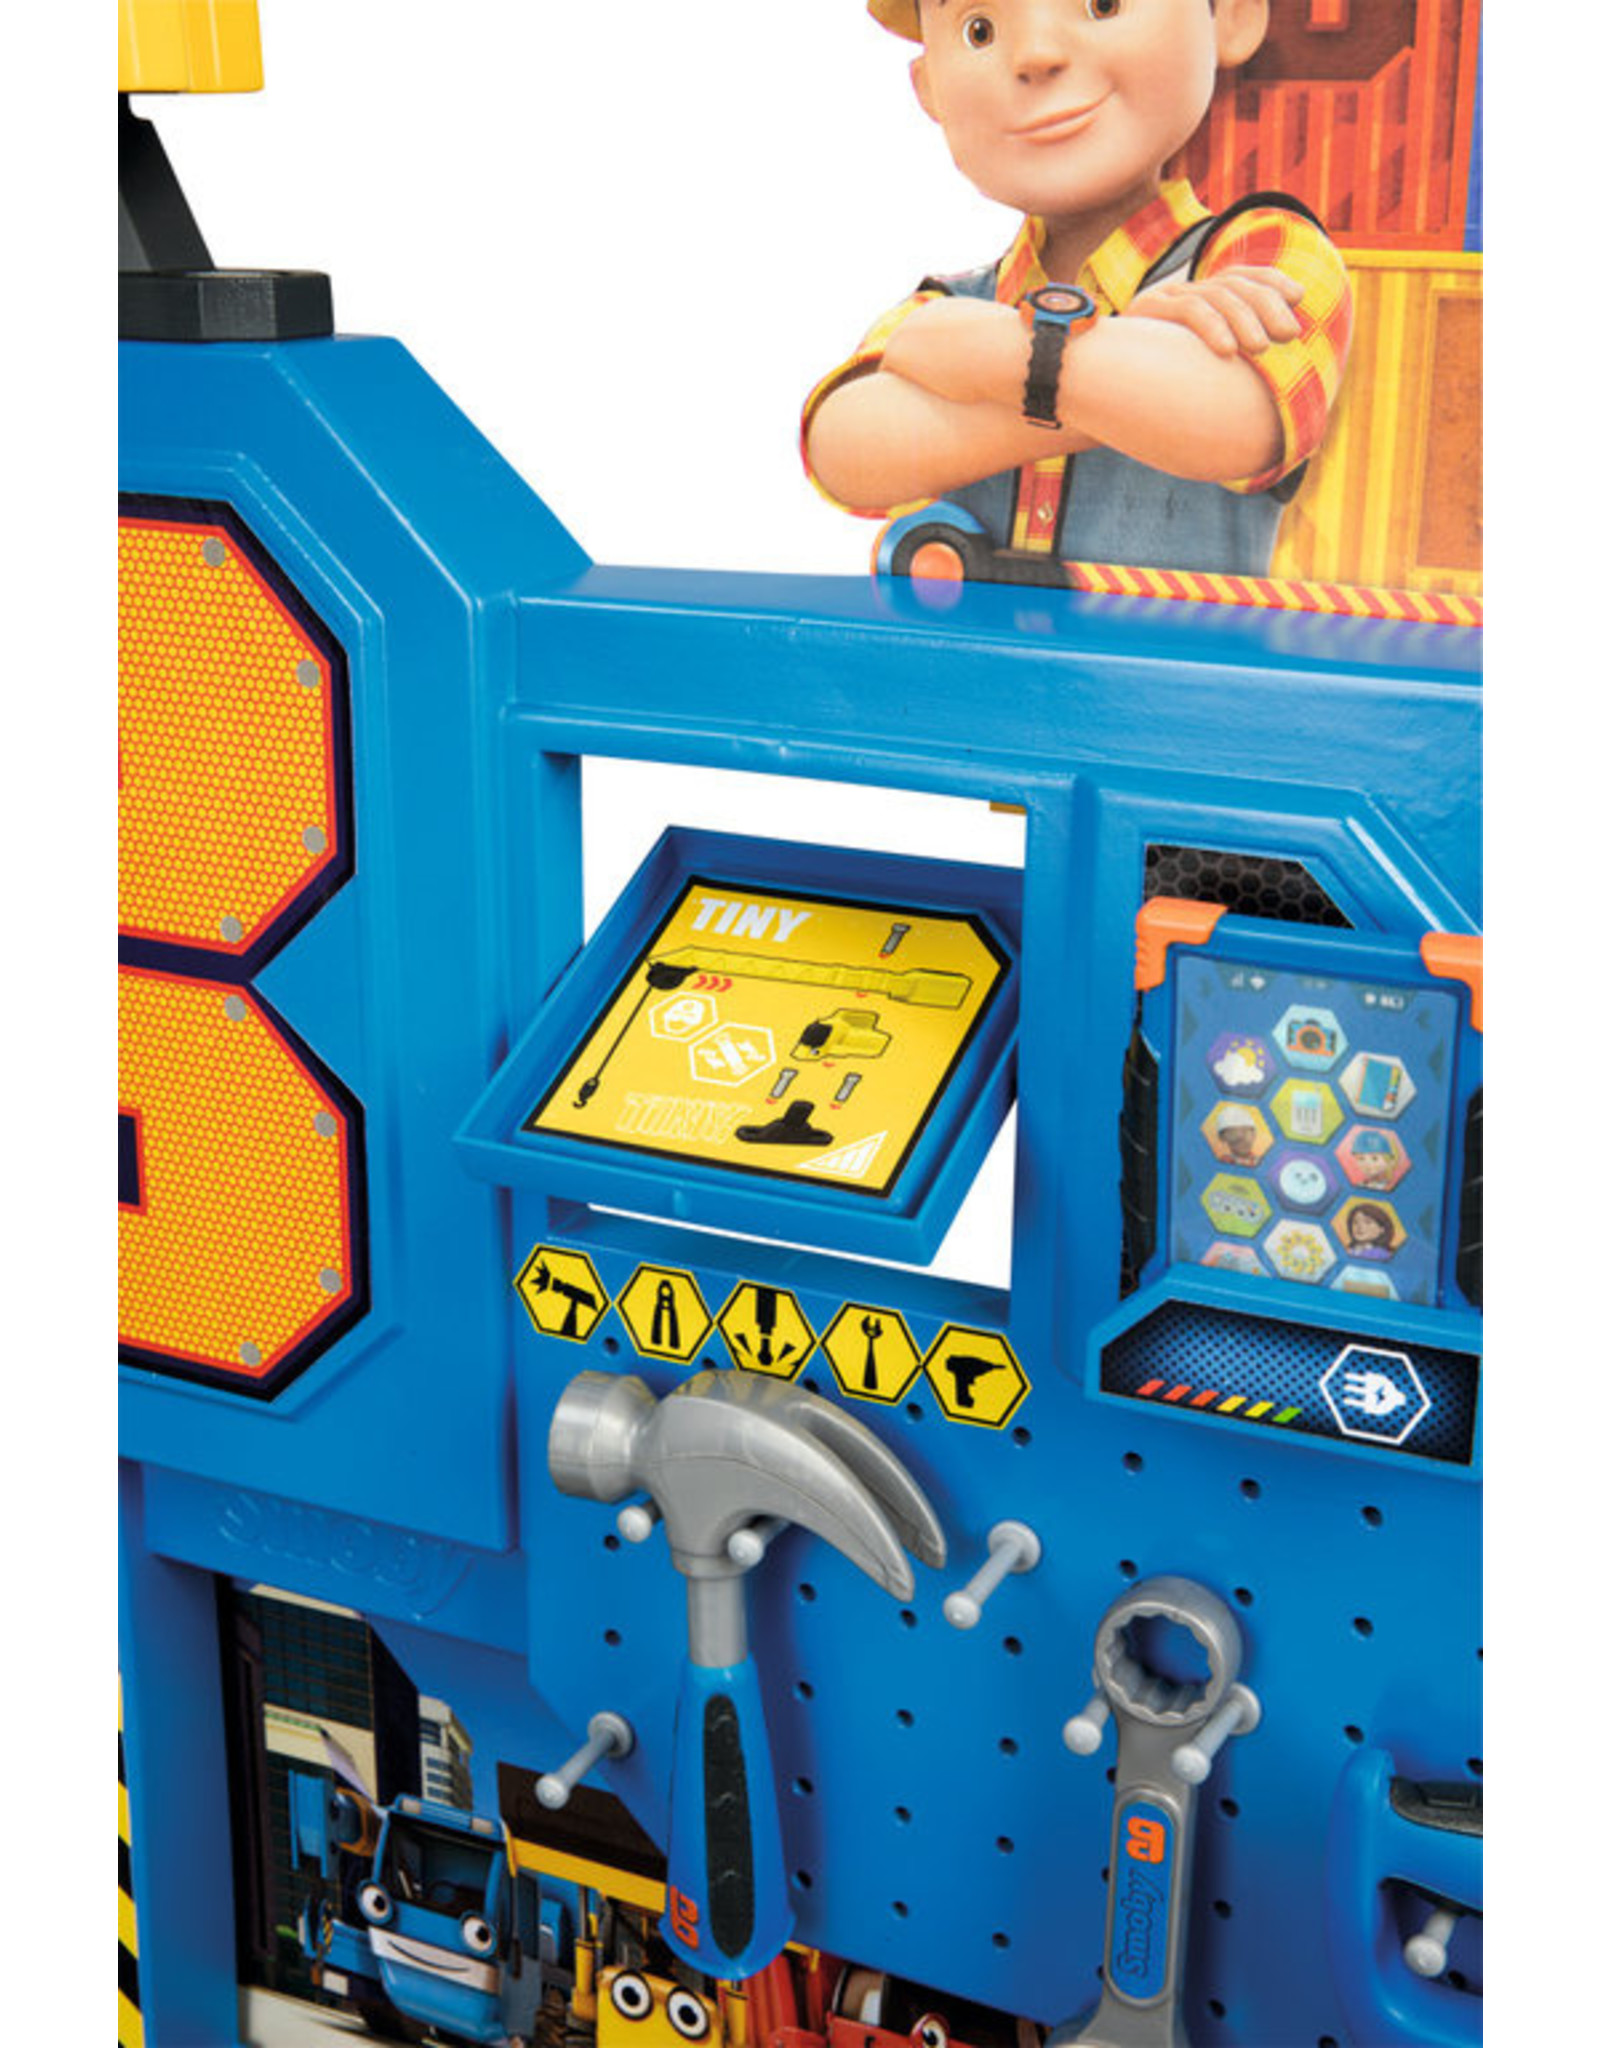 Smoby Smoby - Bob de Bouwer - Werkbank met kraan - Smoby - Altoys